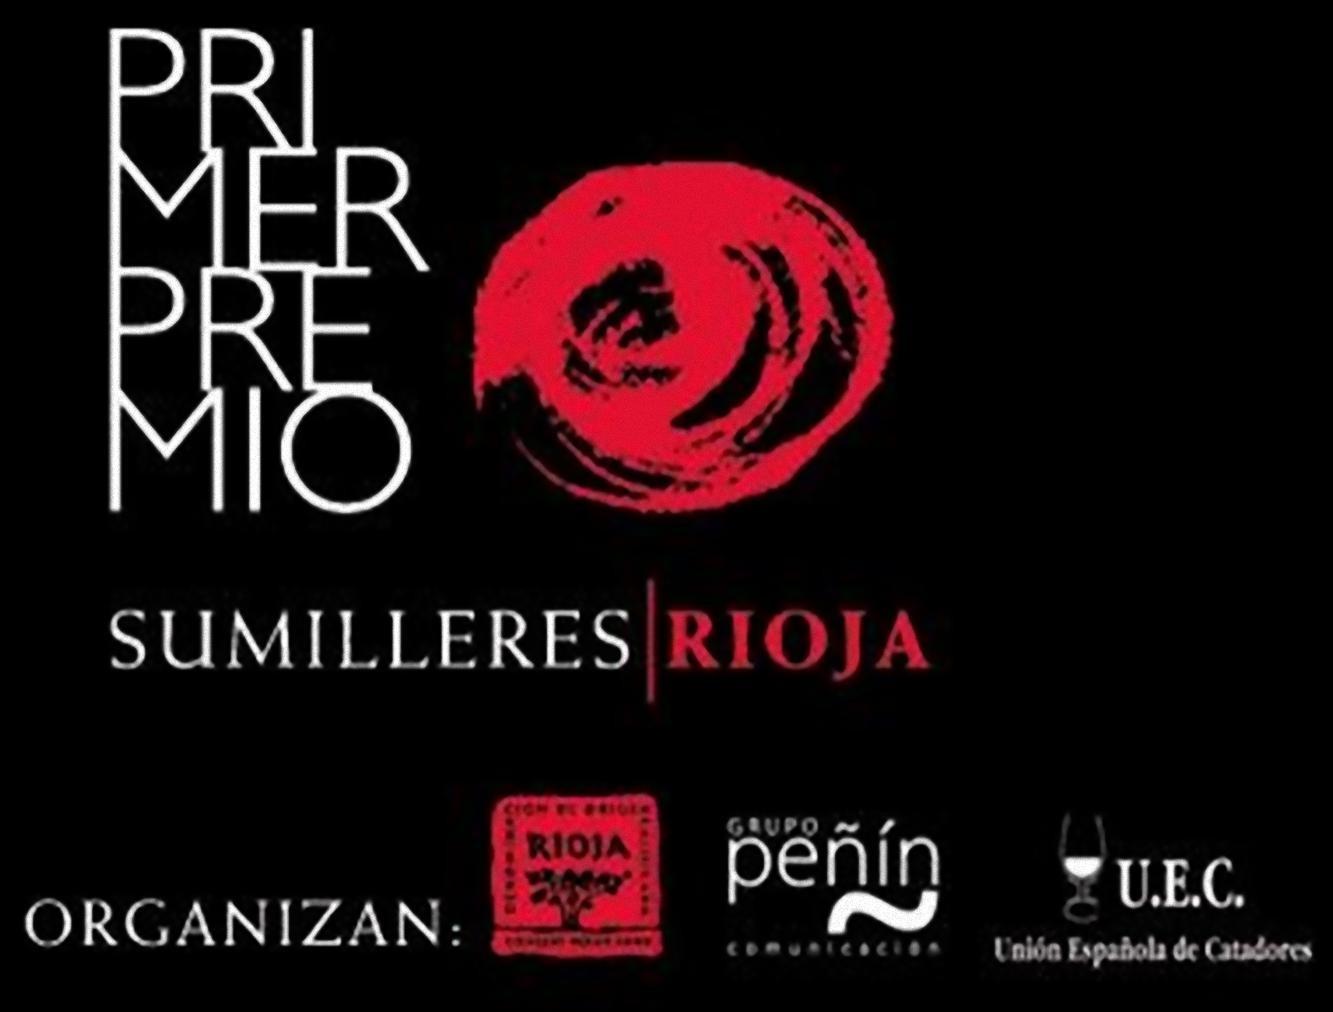 Premio Sumiller Rioja 2007